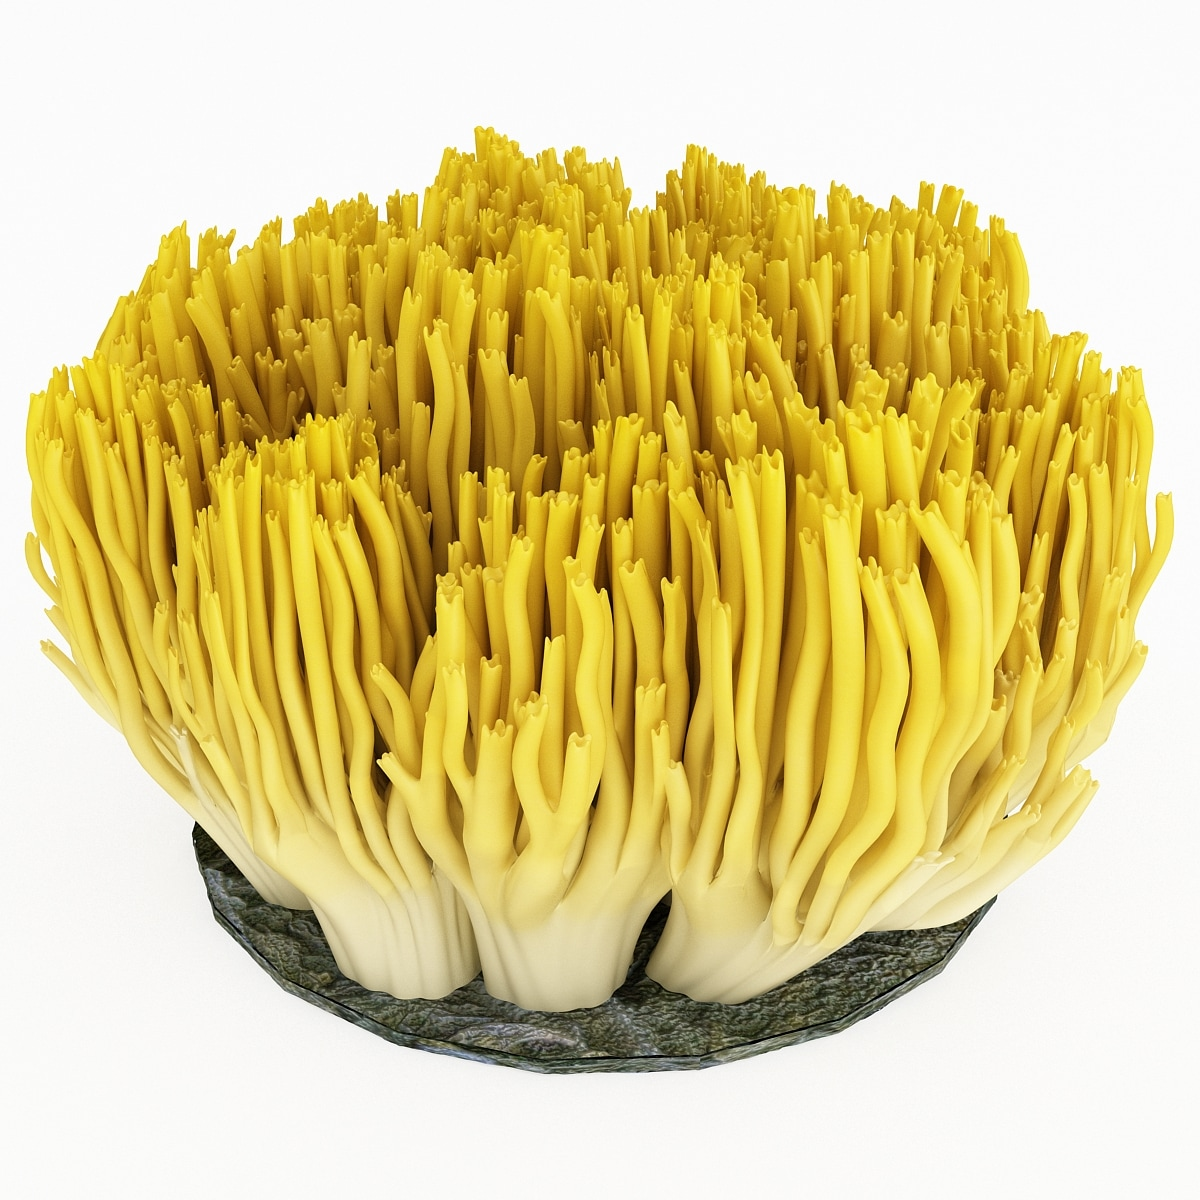 coral fungus 3d model